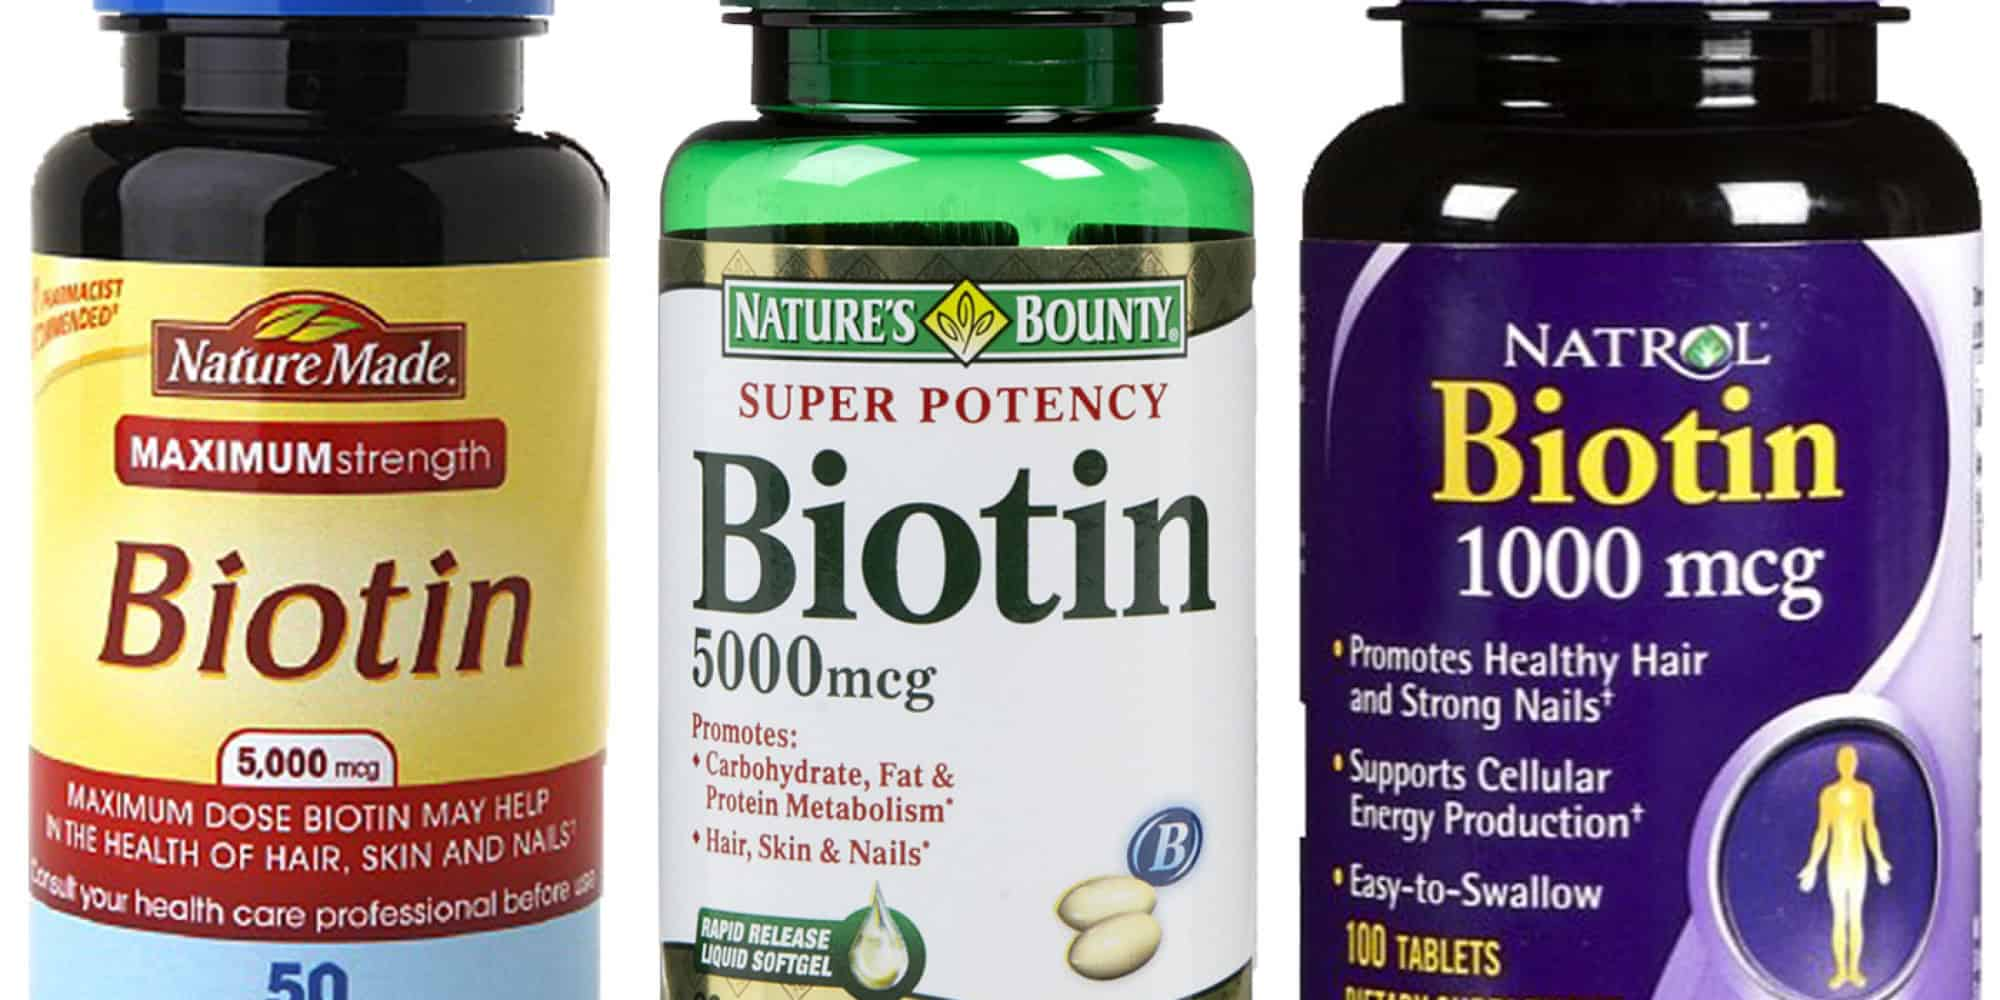 biotin for nails